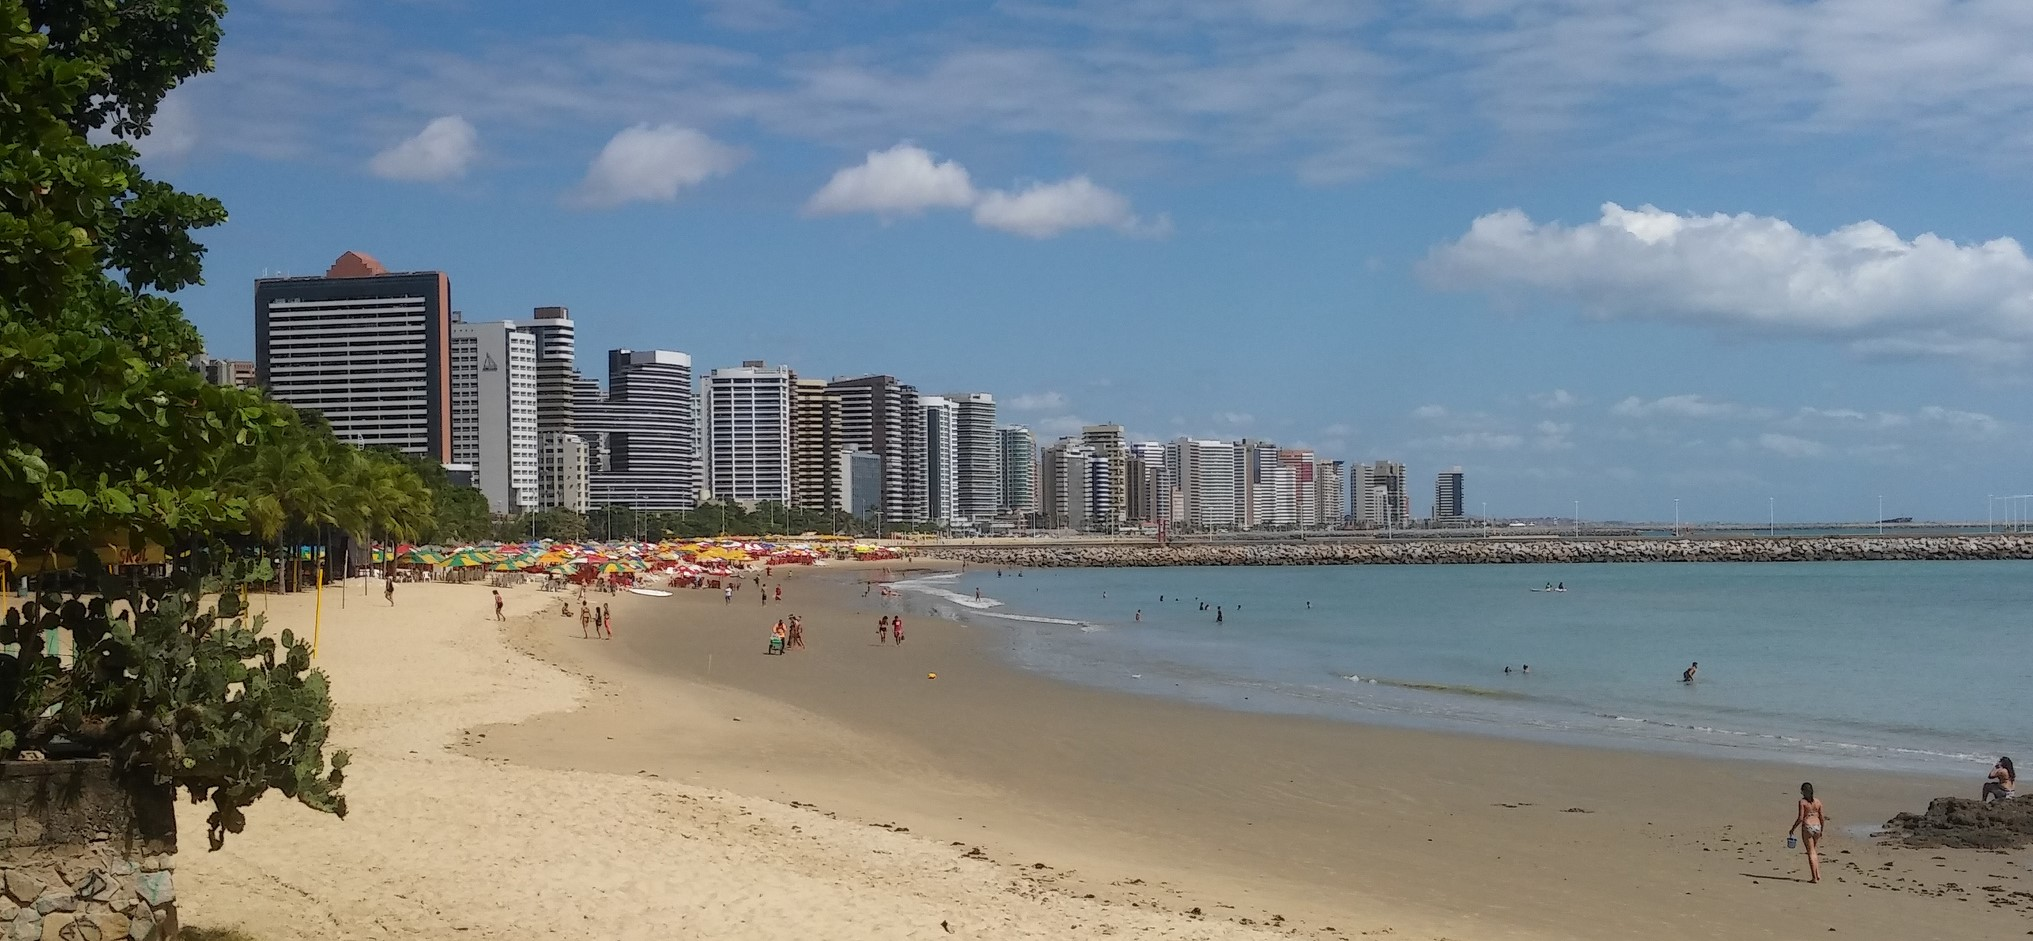 Vacanze a Fortaleza, ferias em Fortaleza